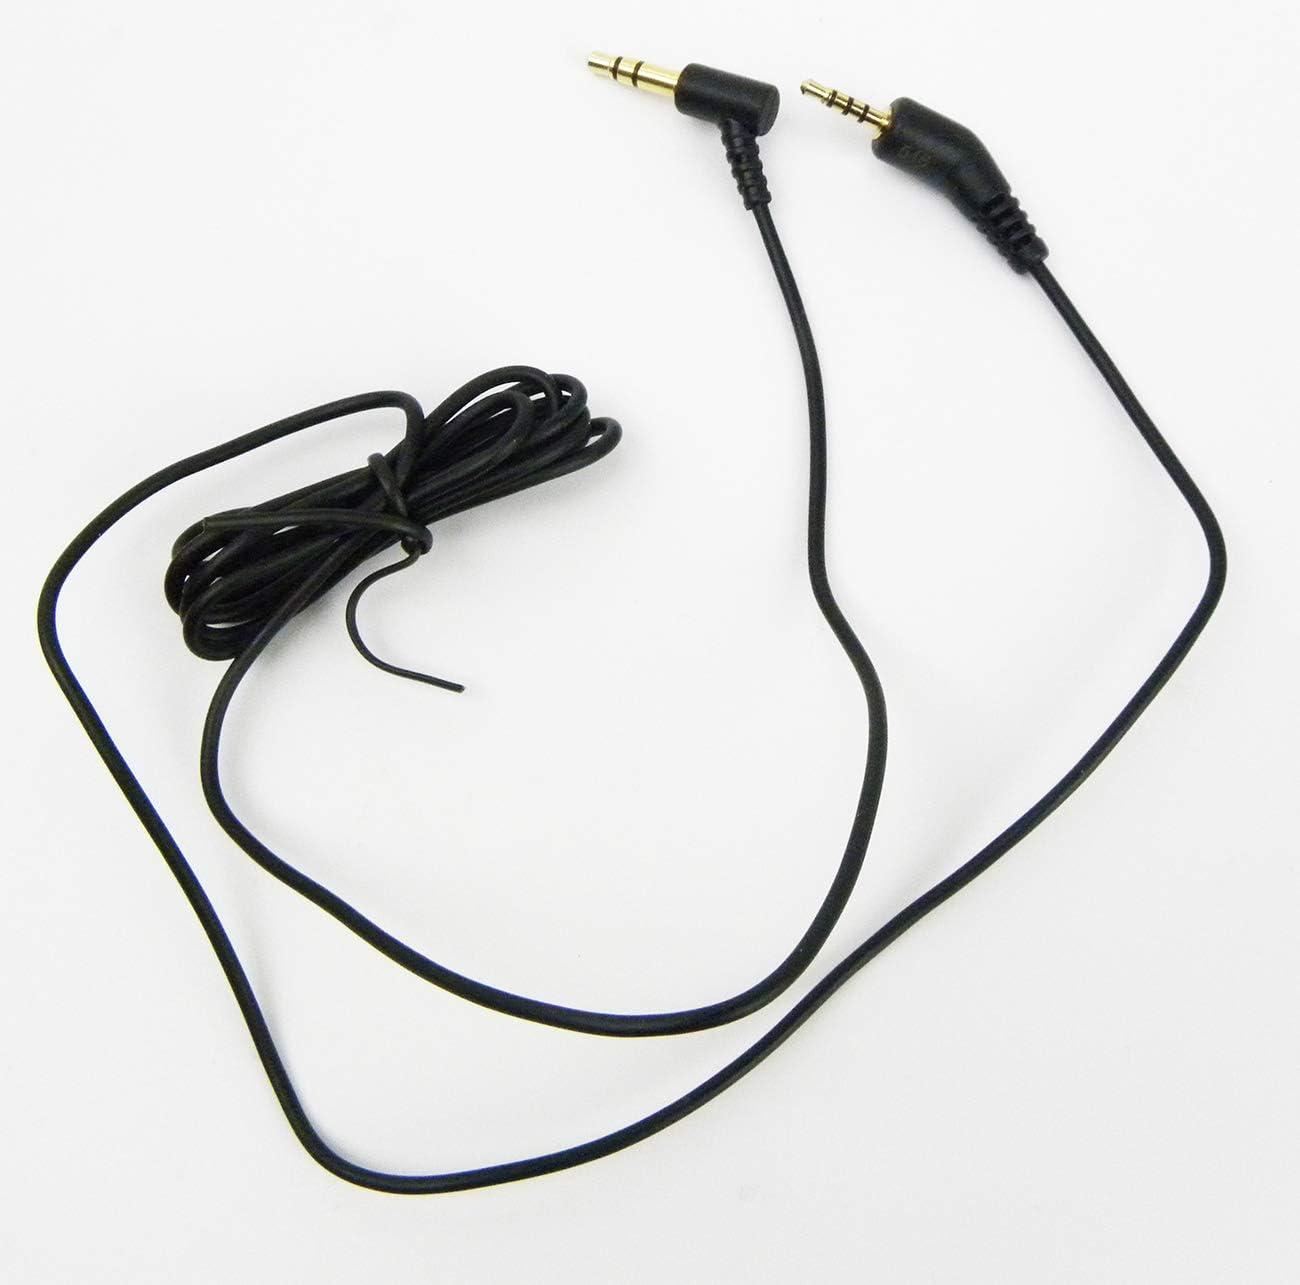 QC3 Audio Cable Cord for QuietComfort 3 Headphone